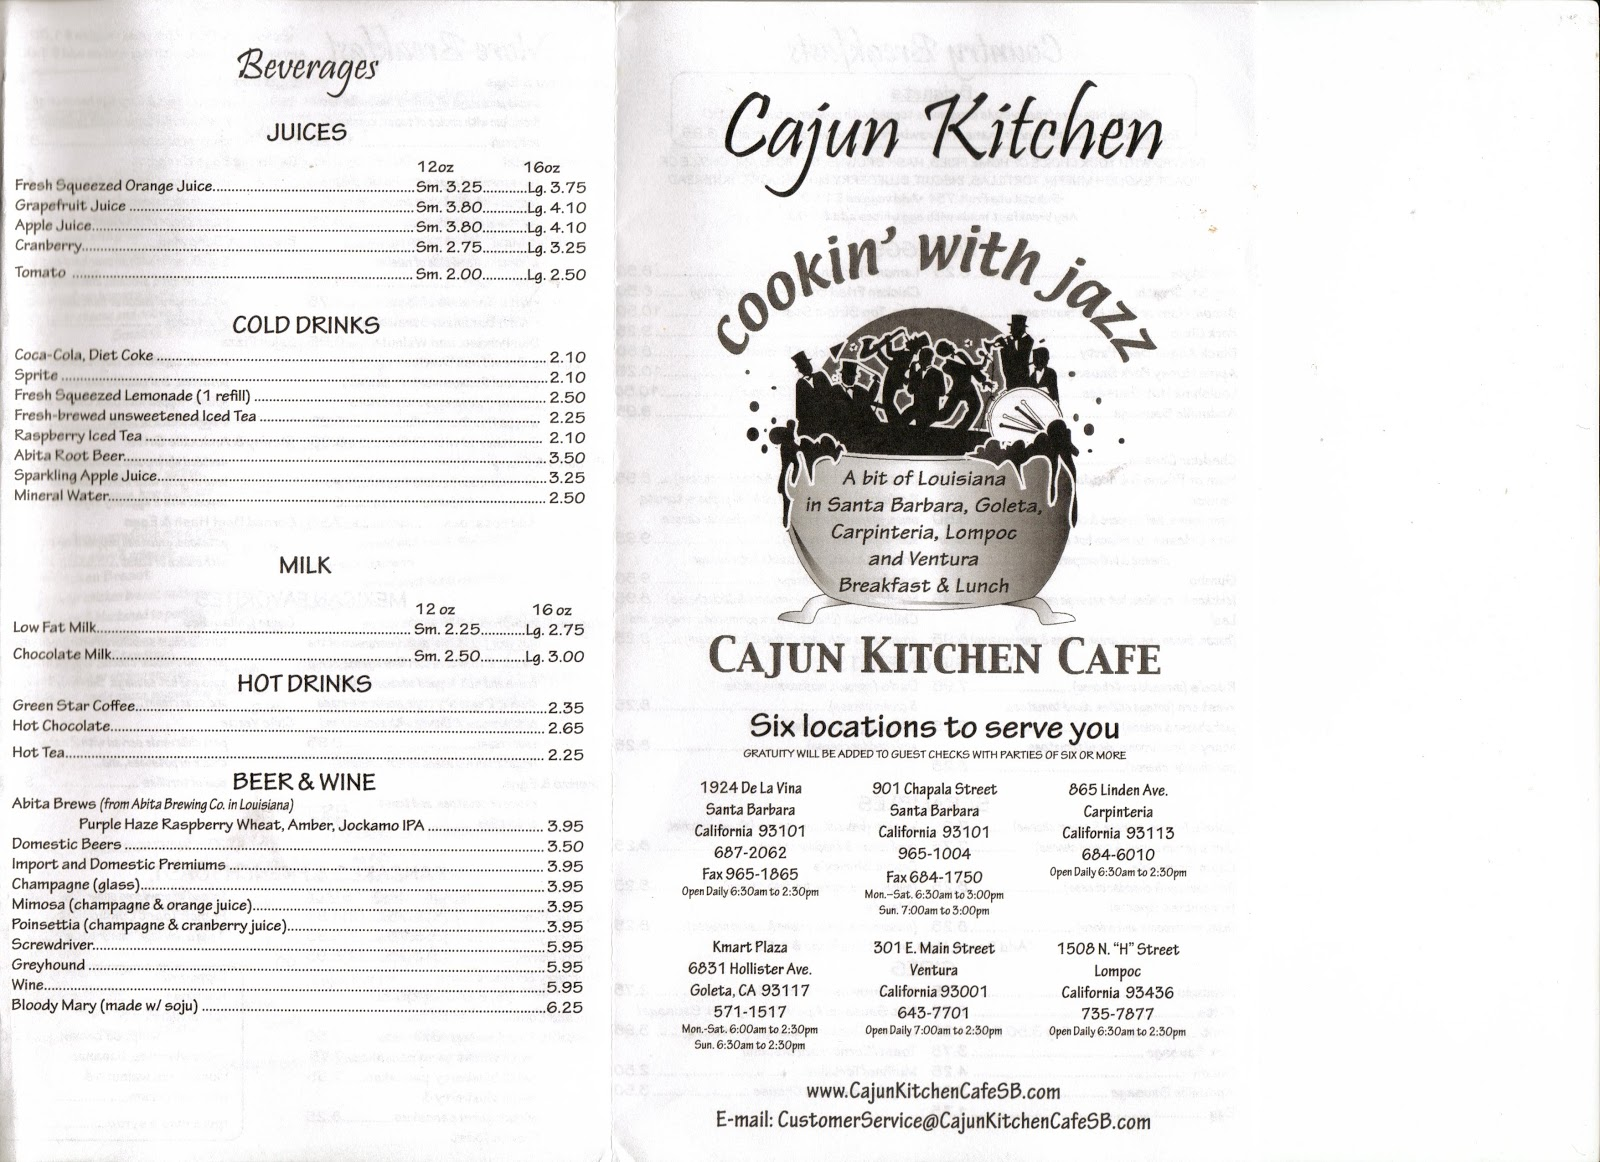 Vc Menu Cajun Kitchen Cafe Ventura Santa Barbara Goleta